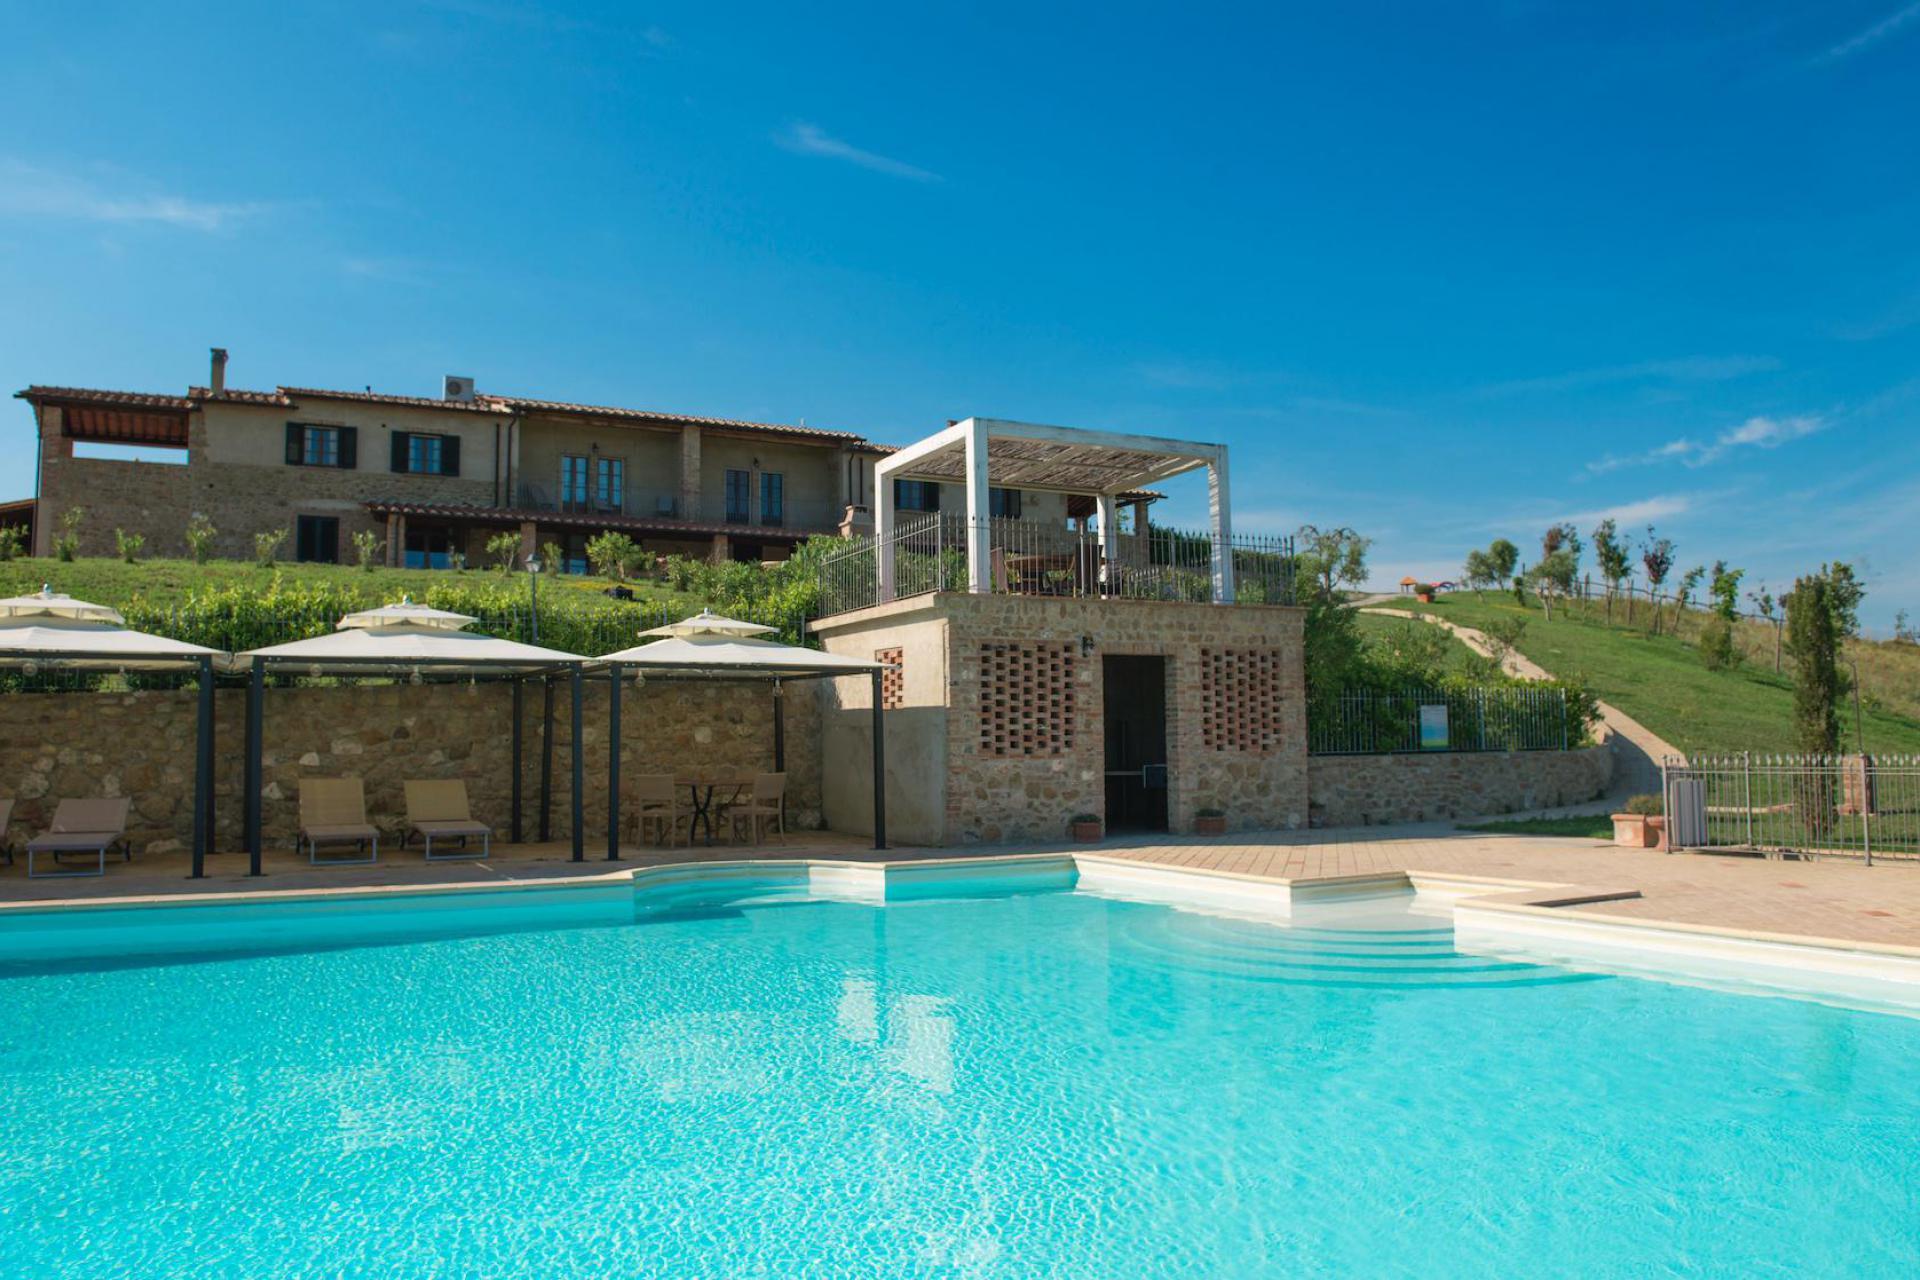 Agriturismo Toscana Agriturismo divertente in Toscana con piscina panoramica